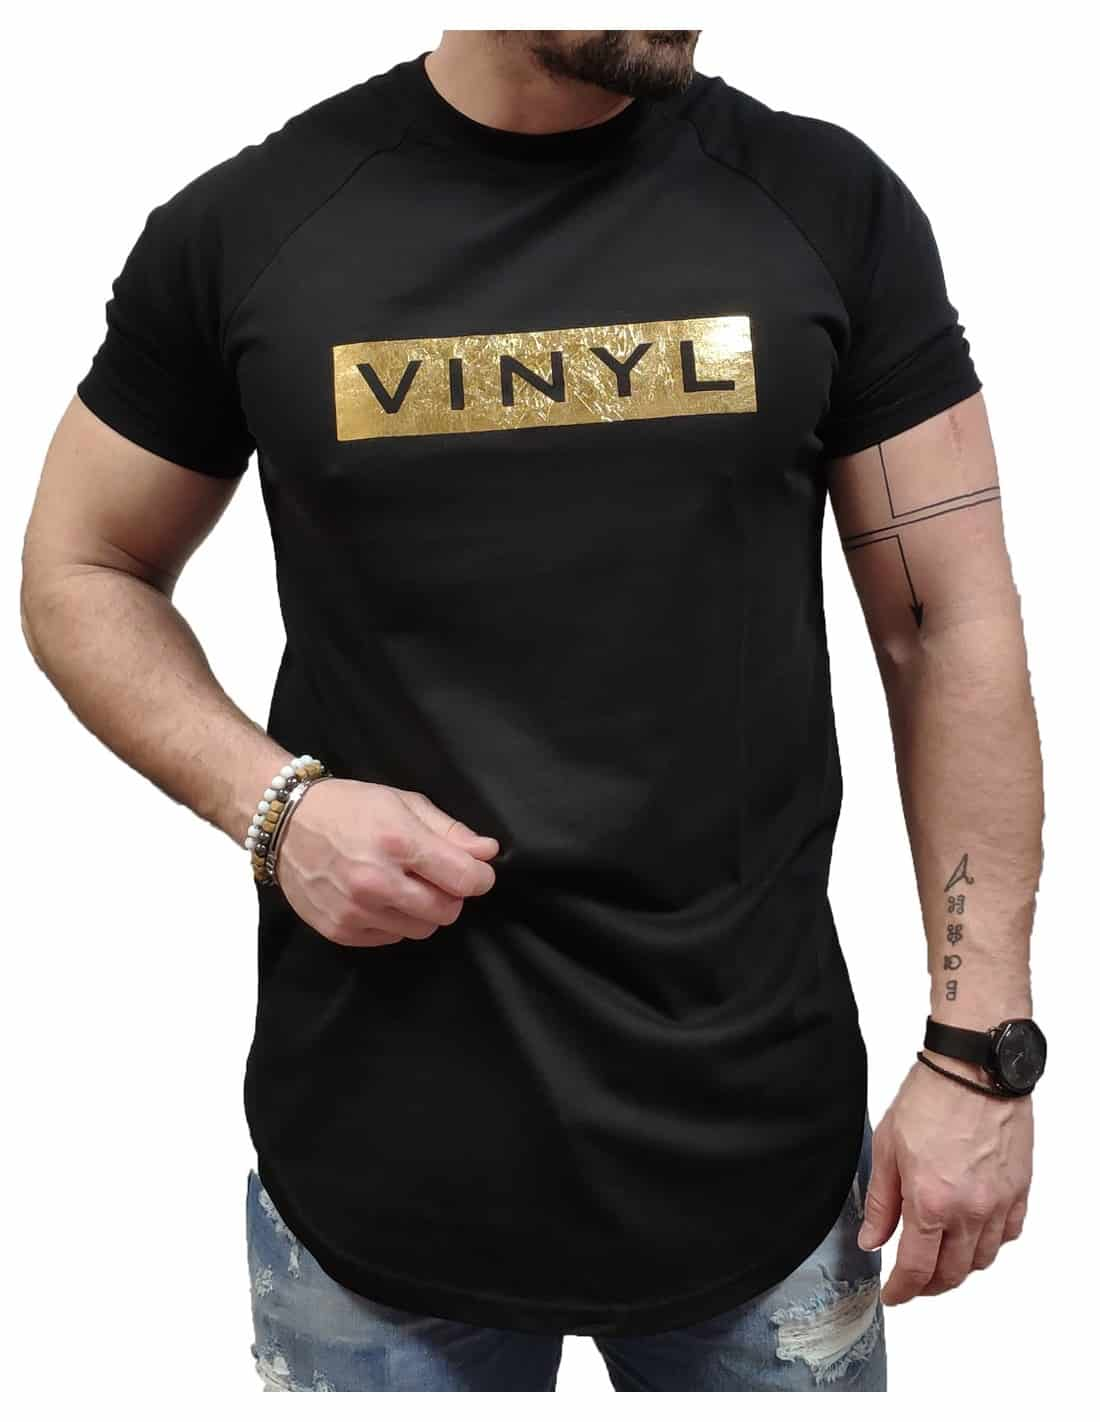 VINYL ART CLOTHING T-SHIRT ΜΕ LOGO ΜΑΥΡΟ 1